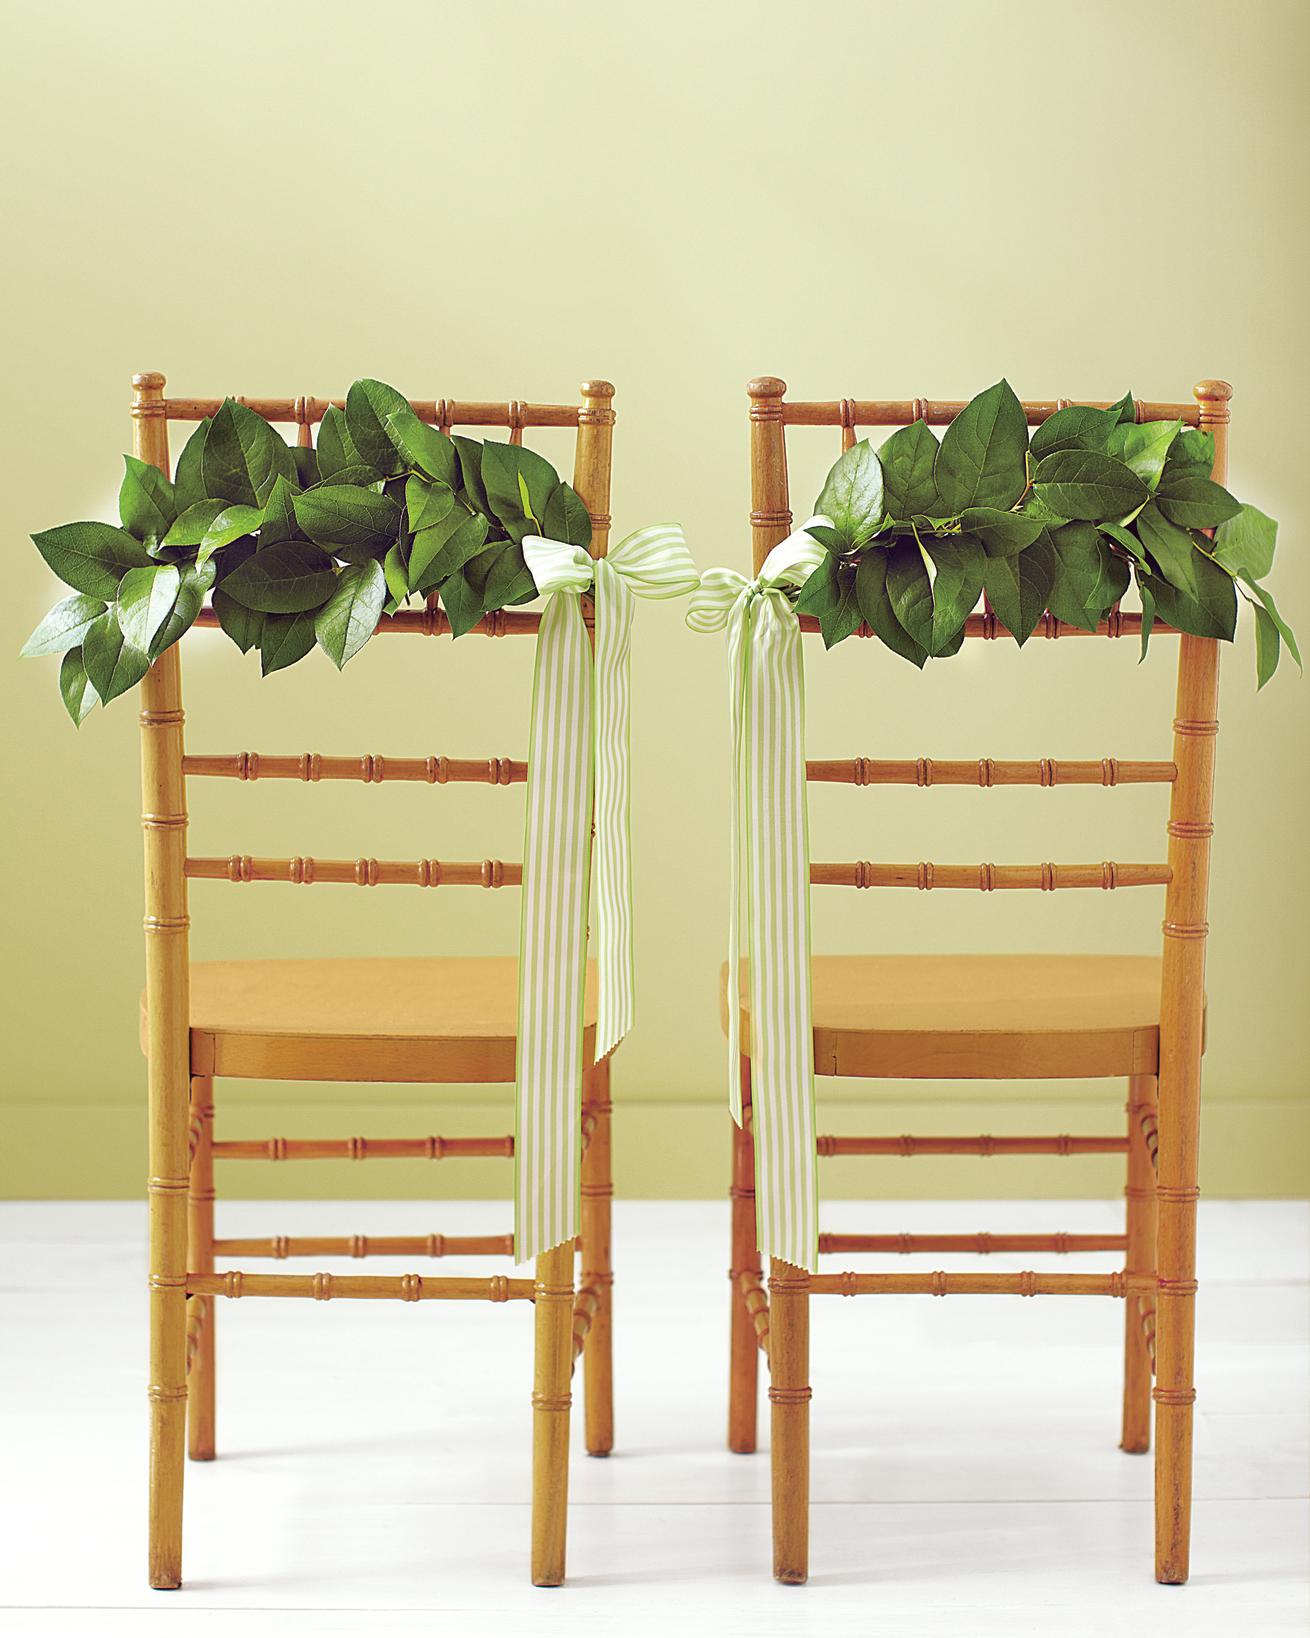 chair-decor-2-mwd108461.jpg